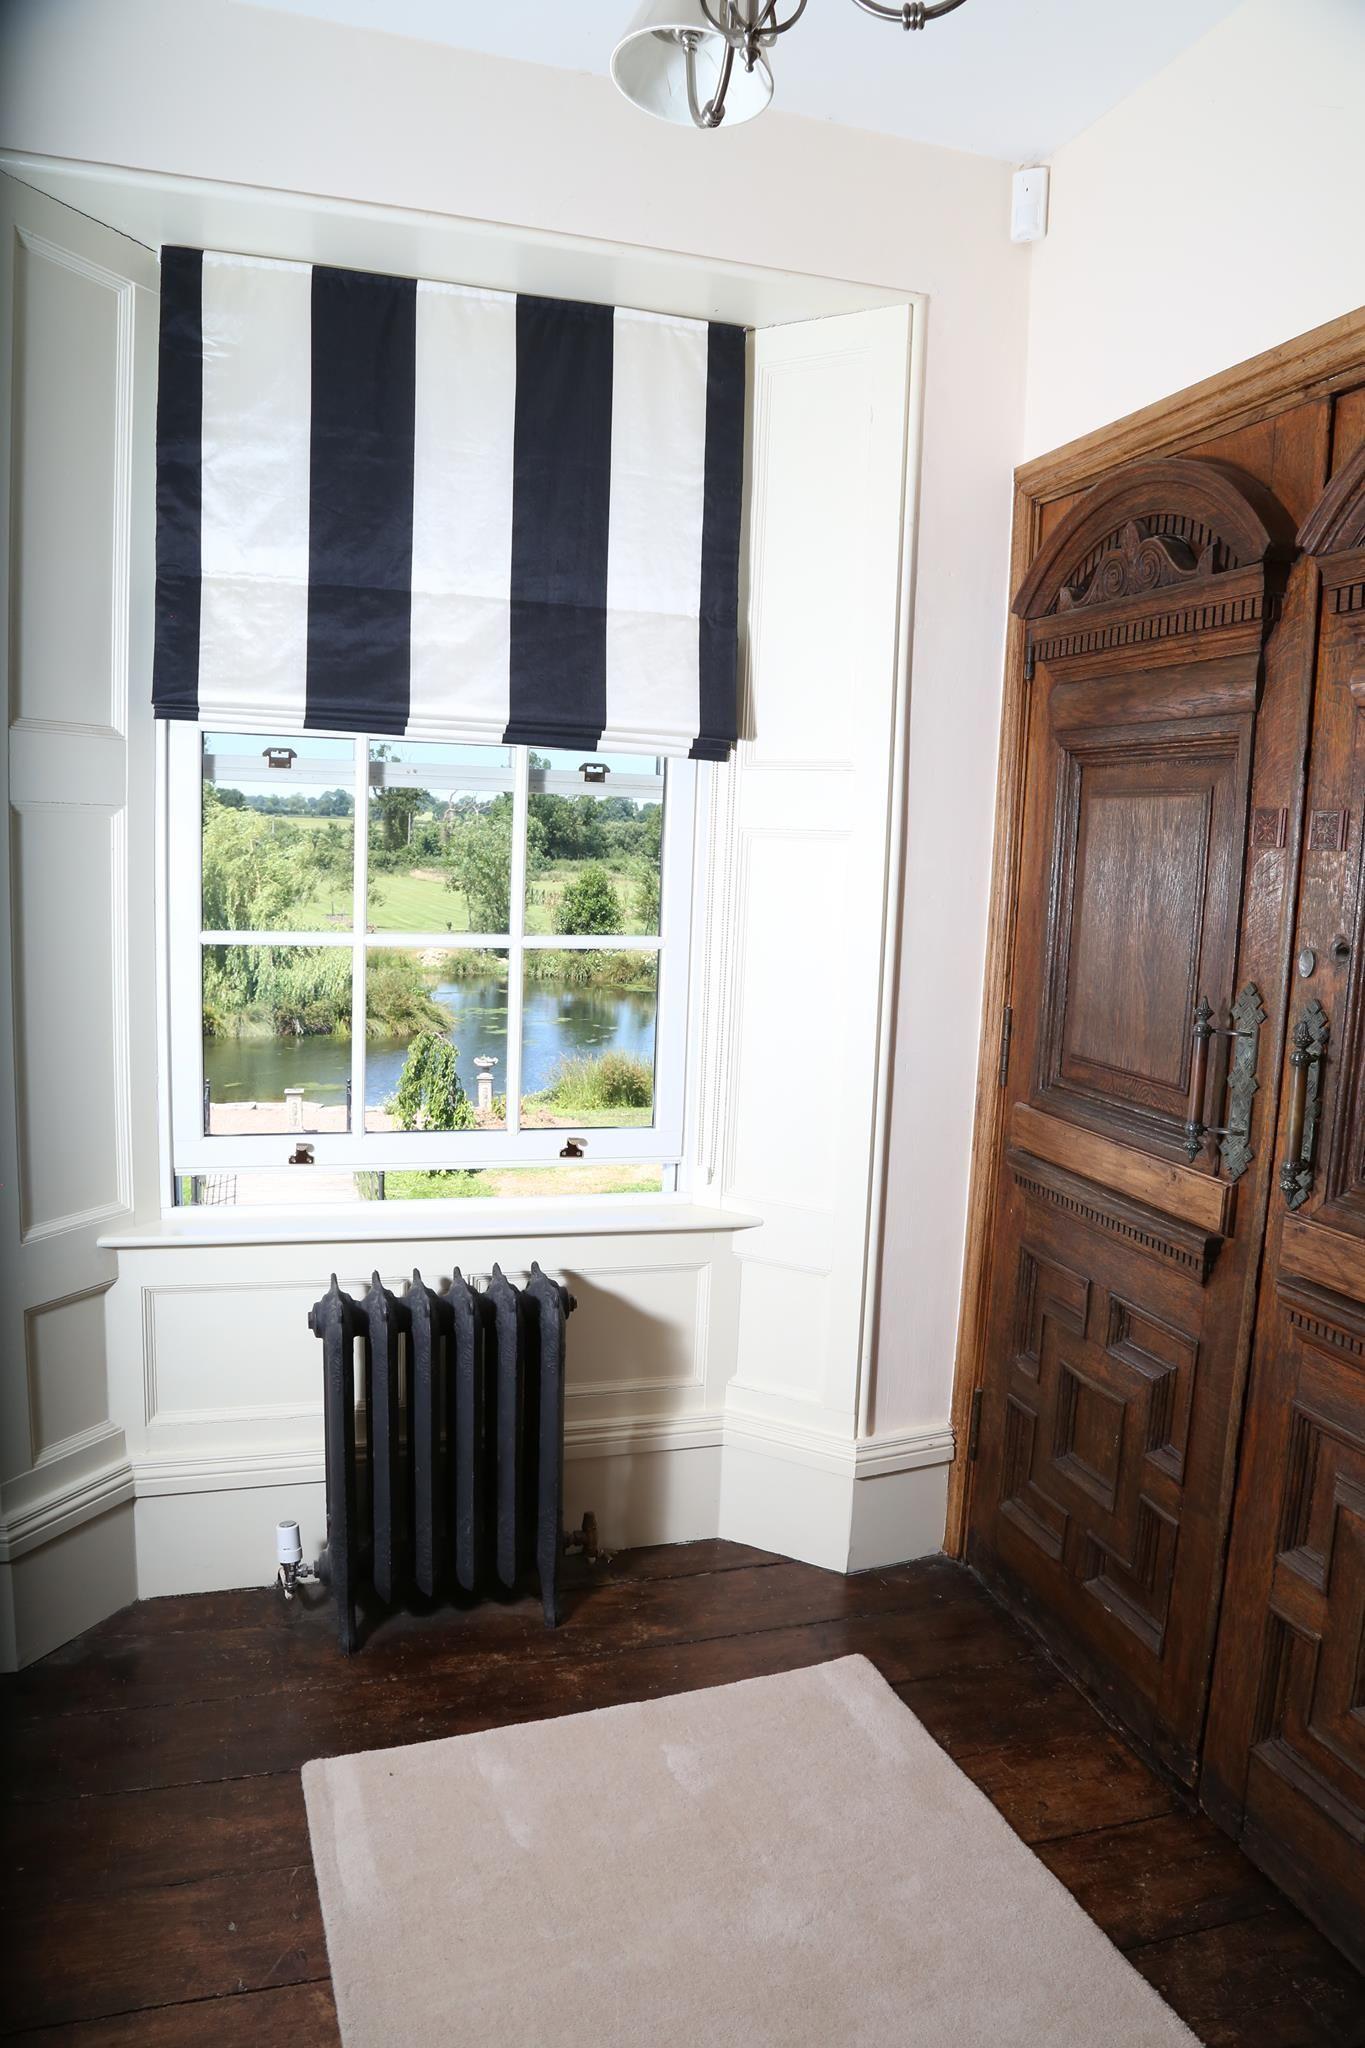 Window cover up ideas   marvelous useful ideas sheer blinds for windows shutter blinds